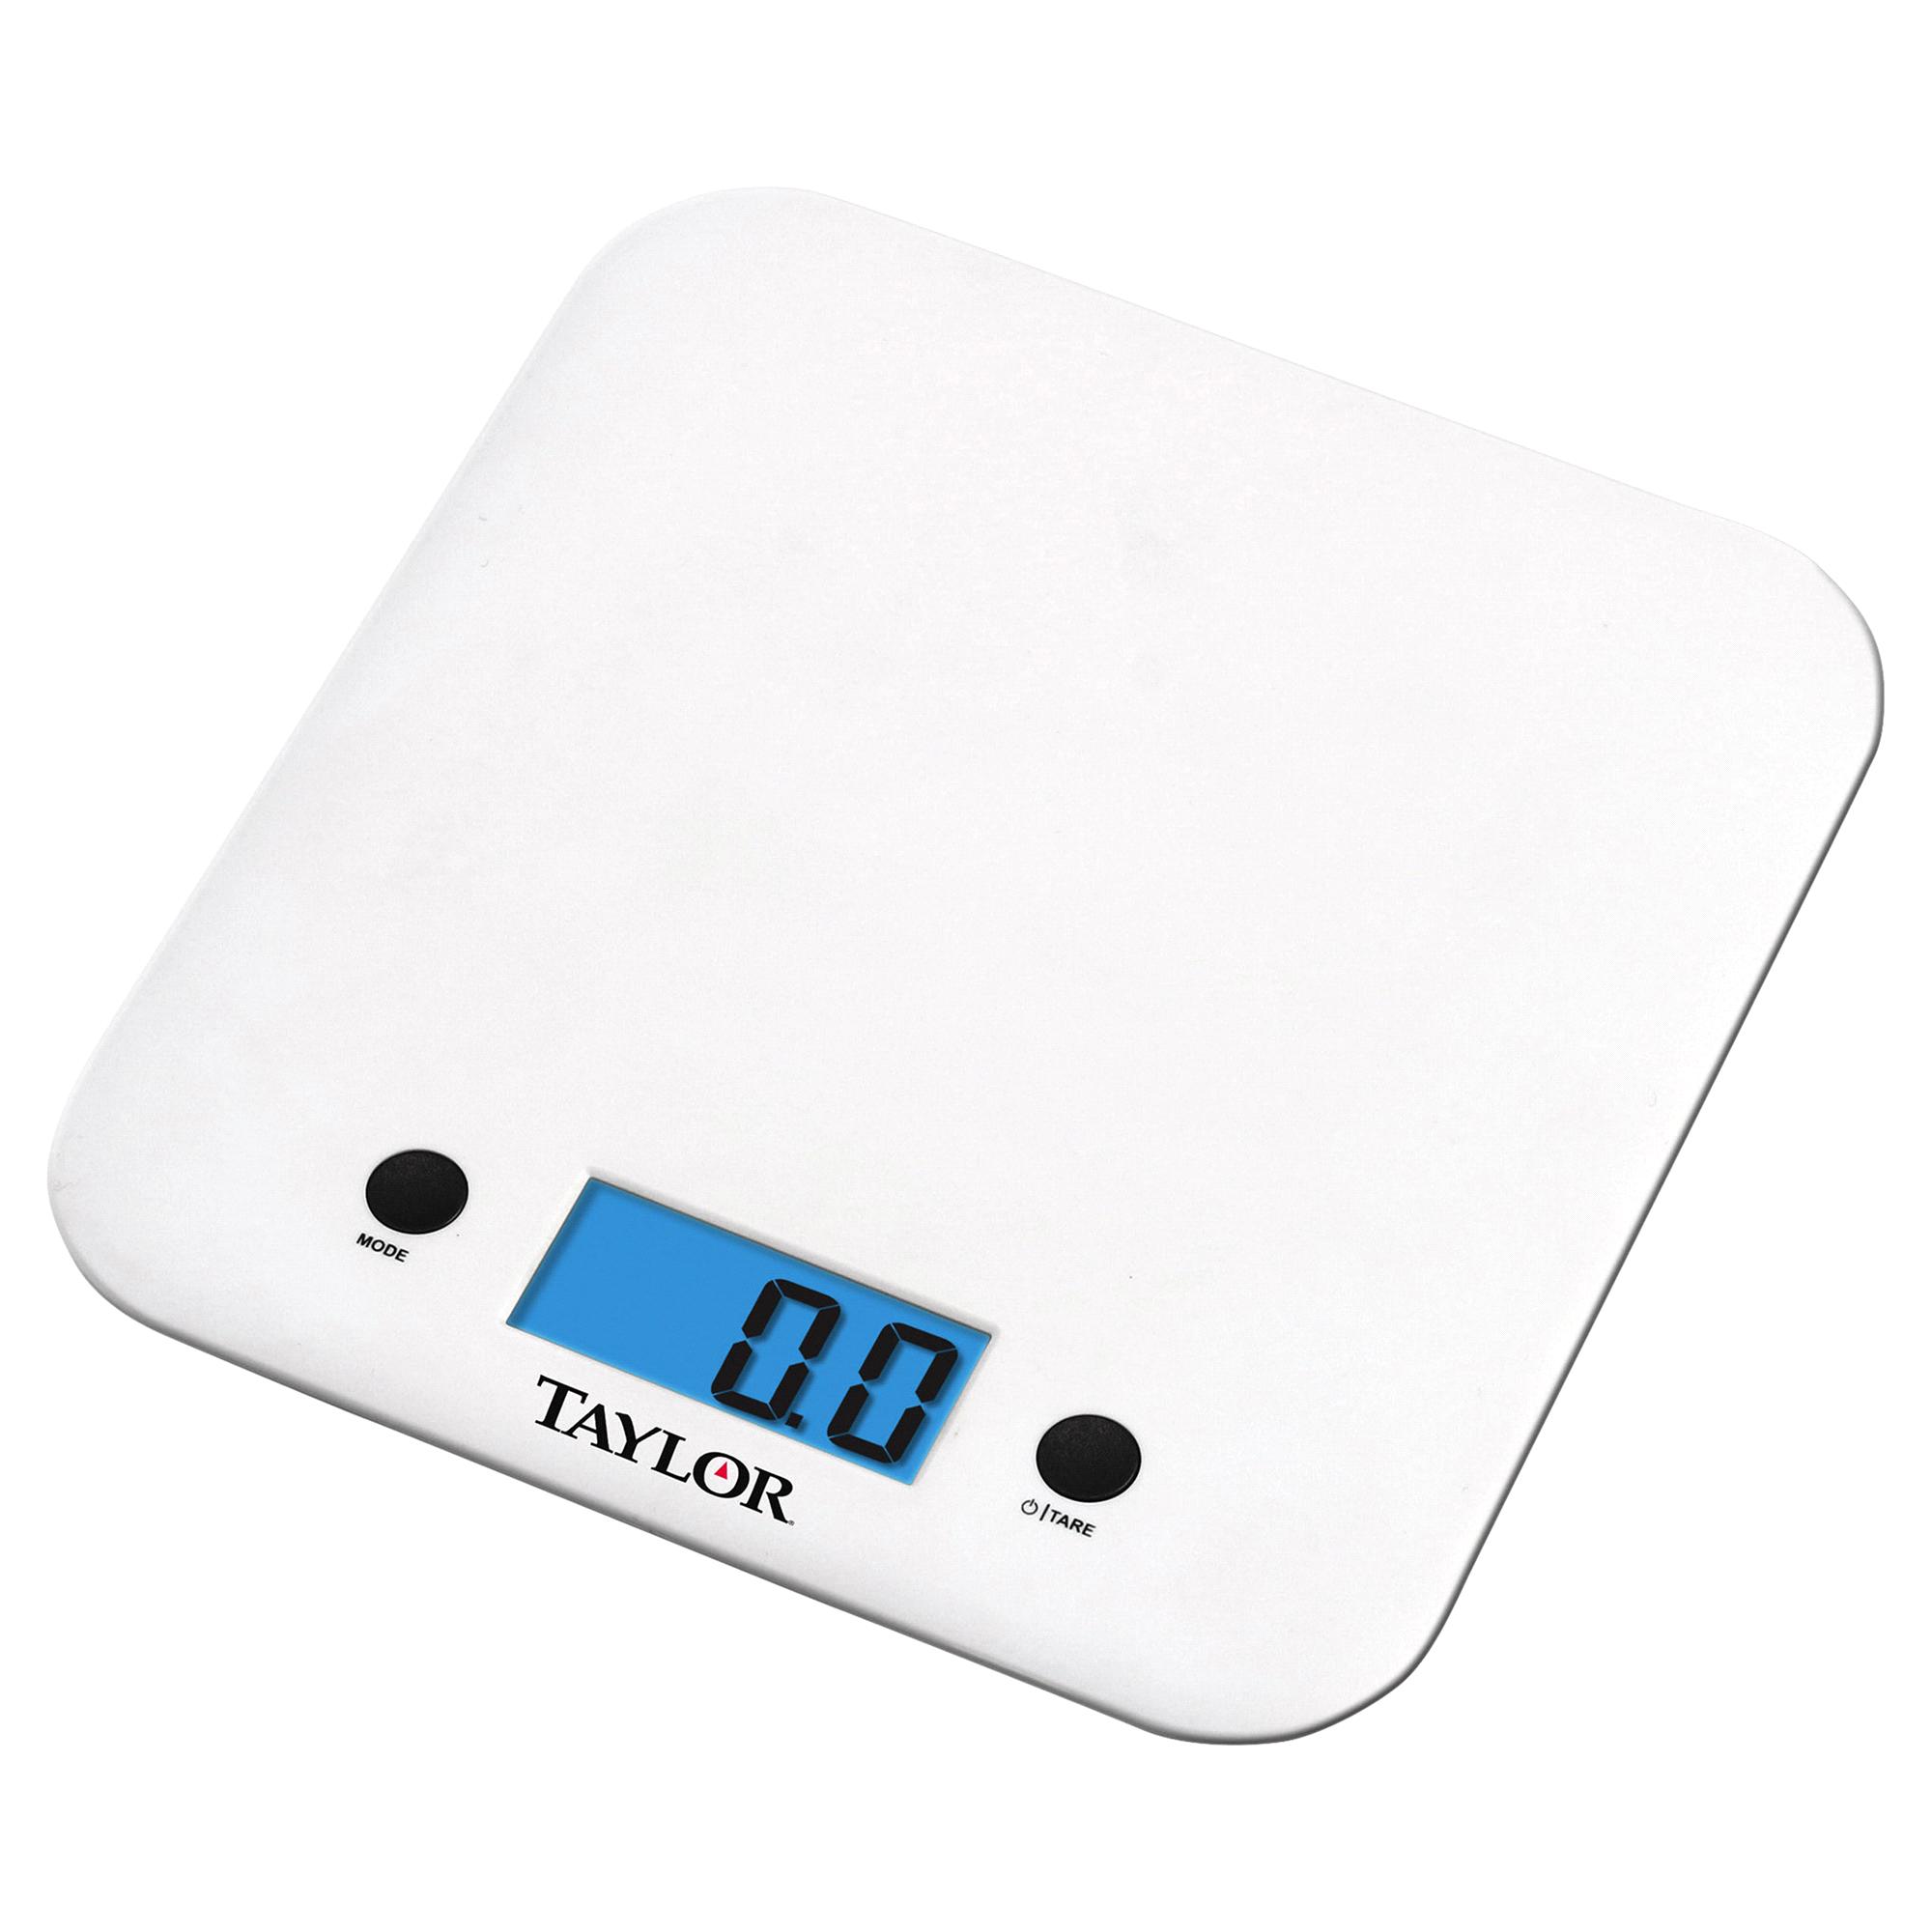 Taylor Digital Ultra Thin Kitchen Scale | Meijer.com